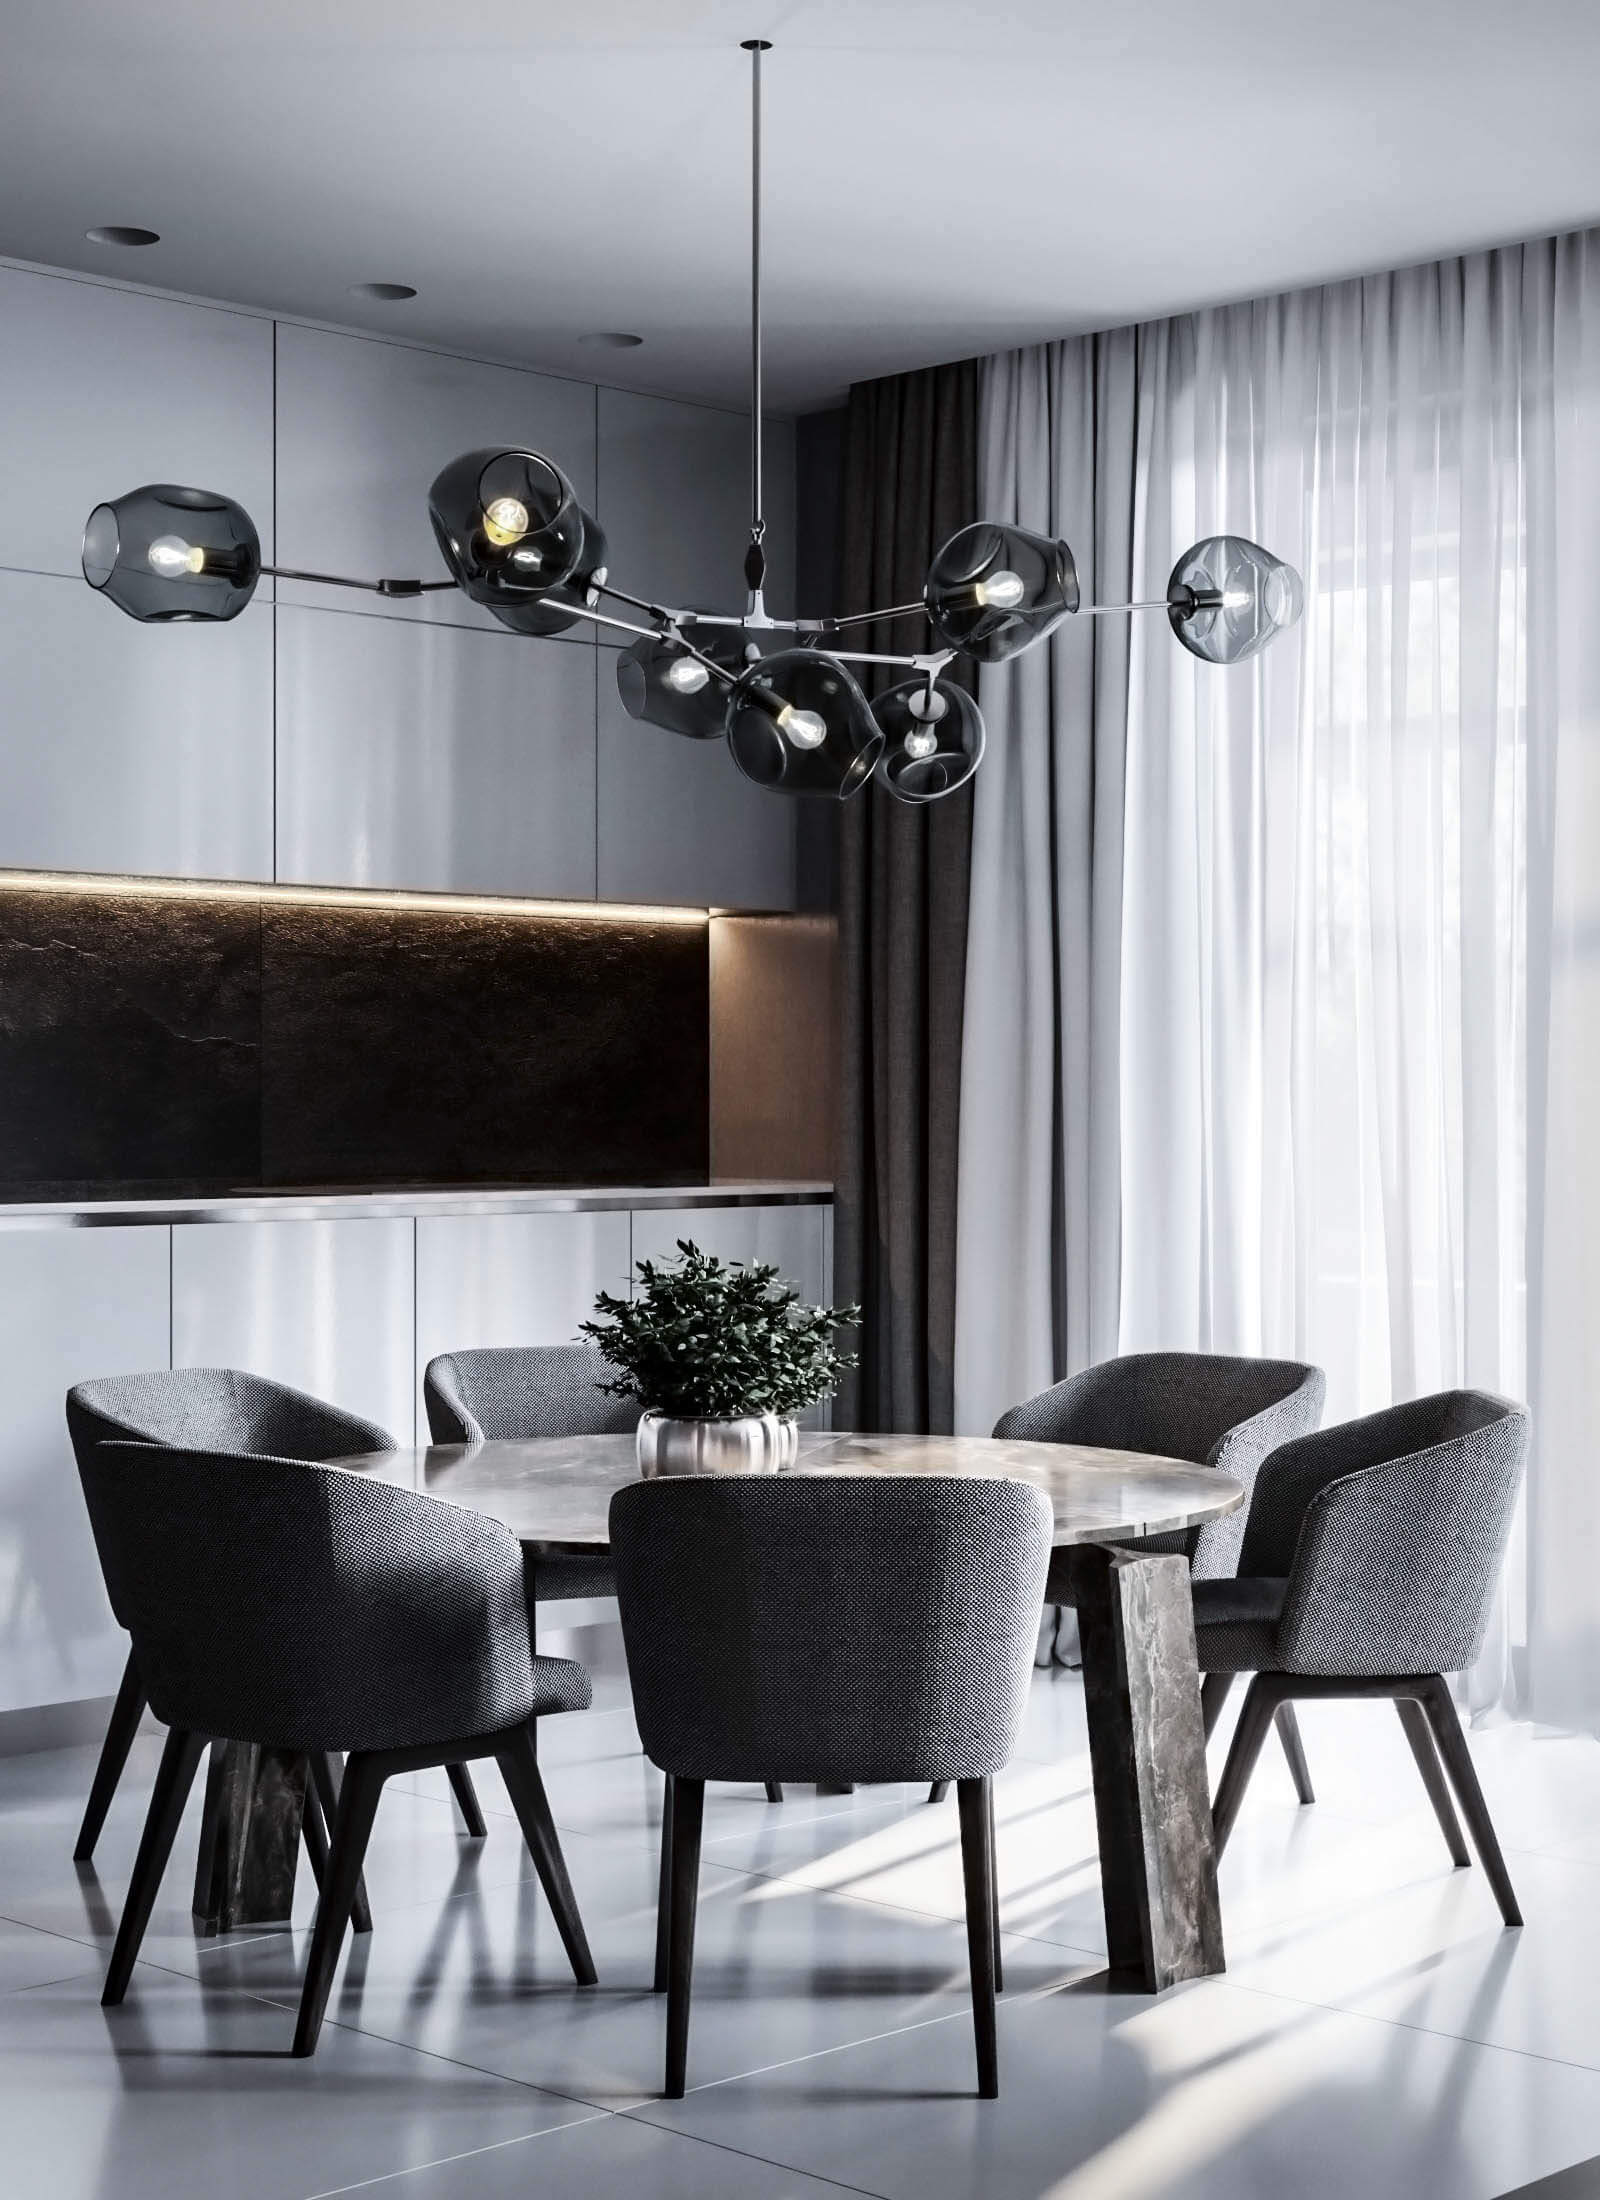 Dubrovka apartment sideboard dining room - cgi visualizatiomn